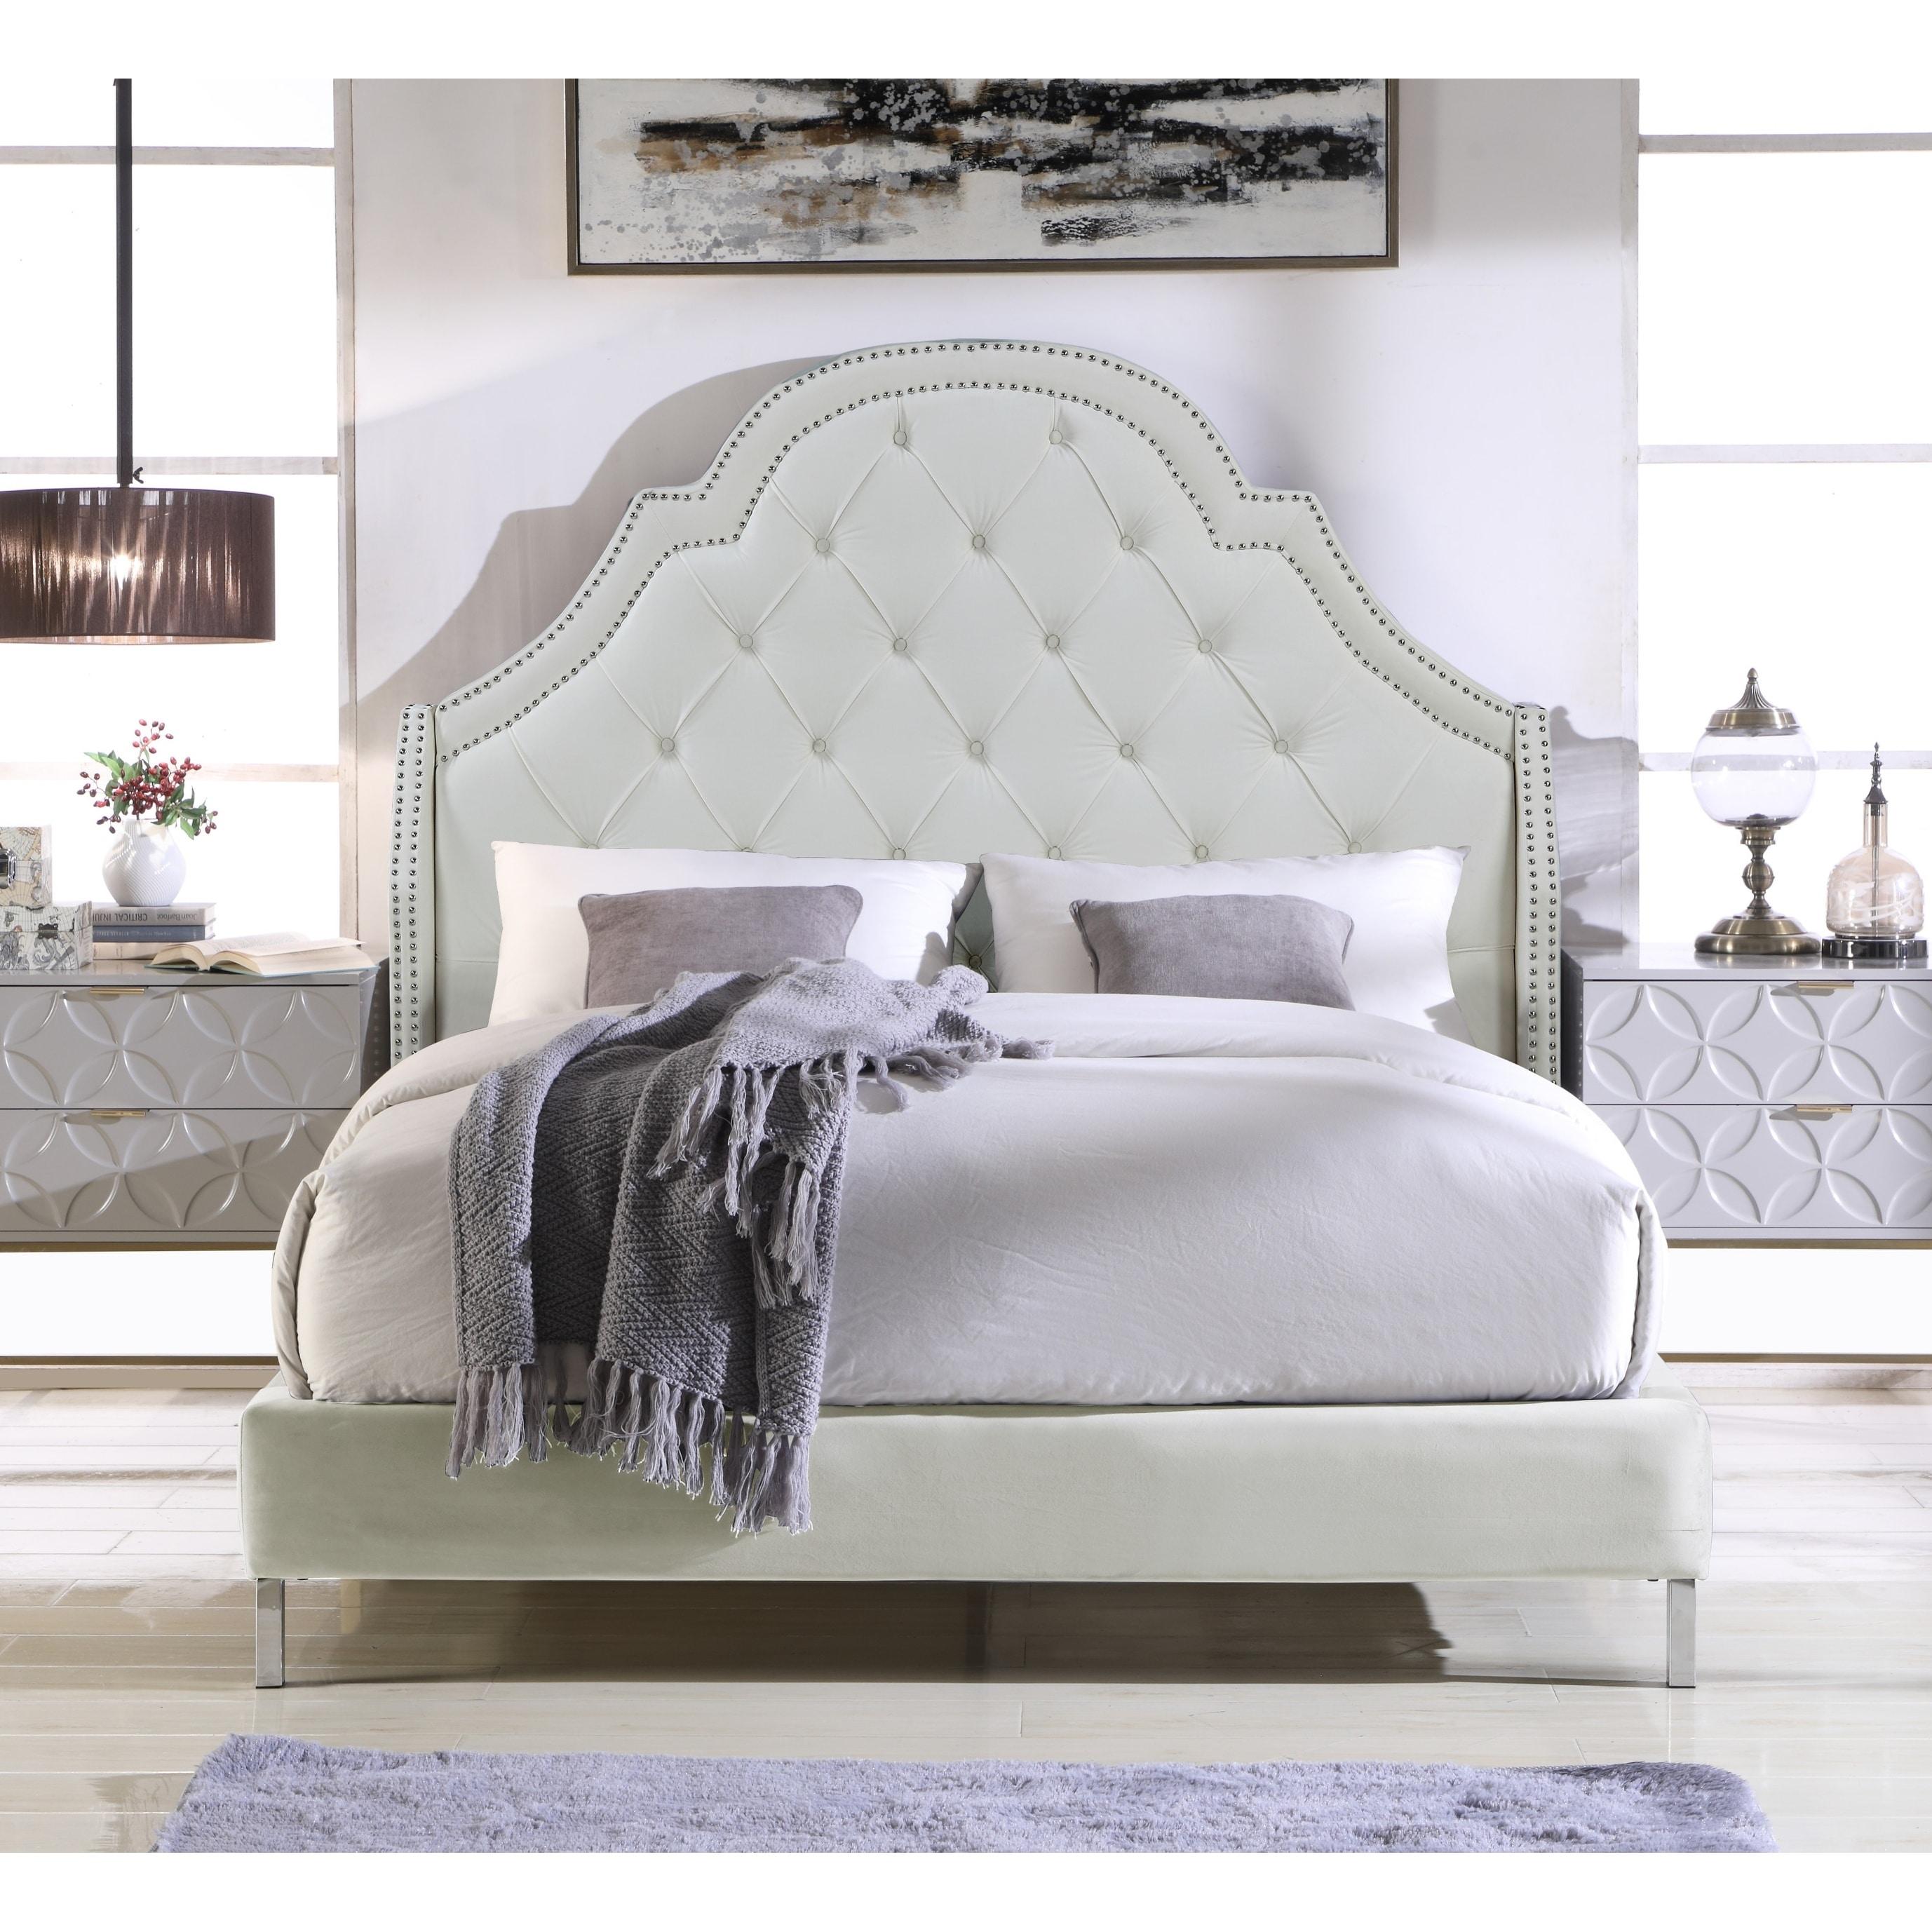 Chic Home Constantine Velvet Upholstered Bed Frame with Headboard